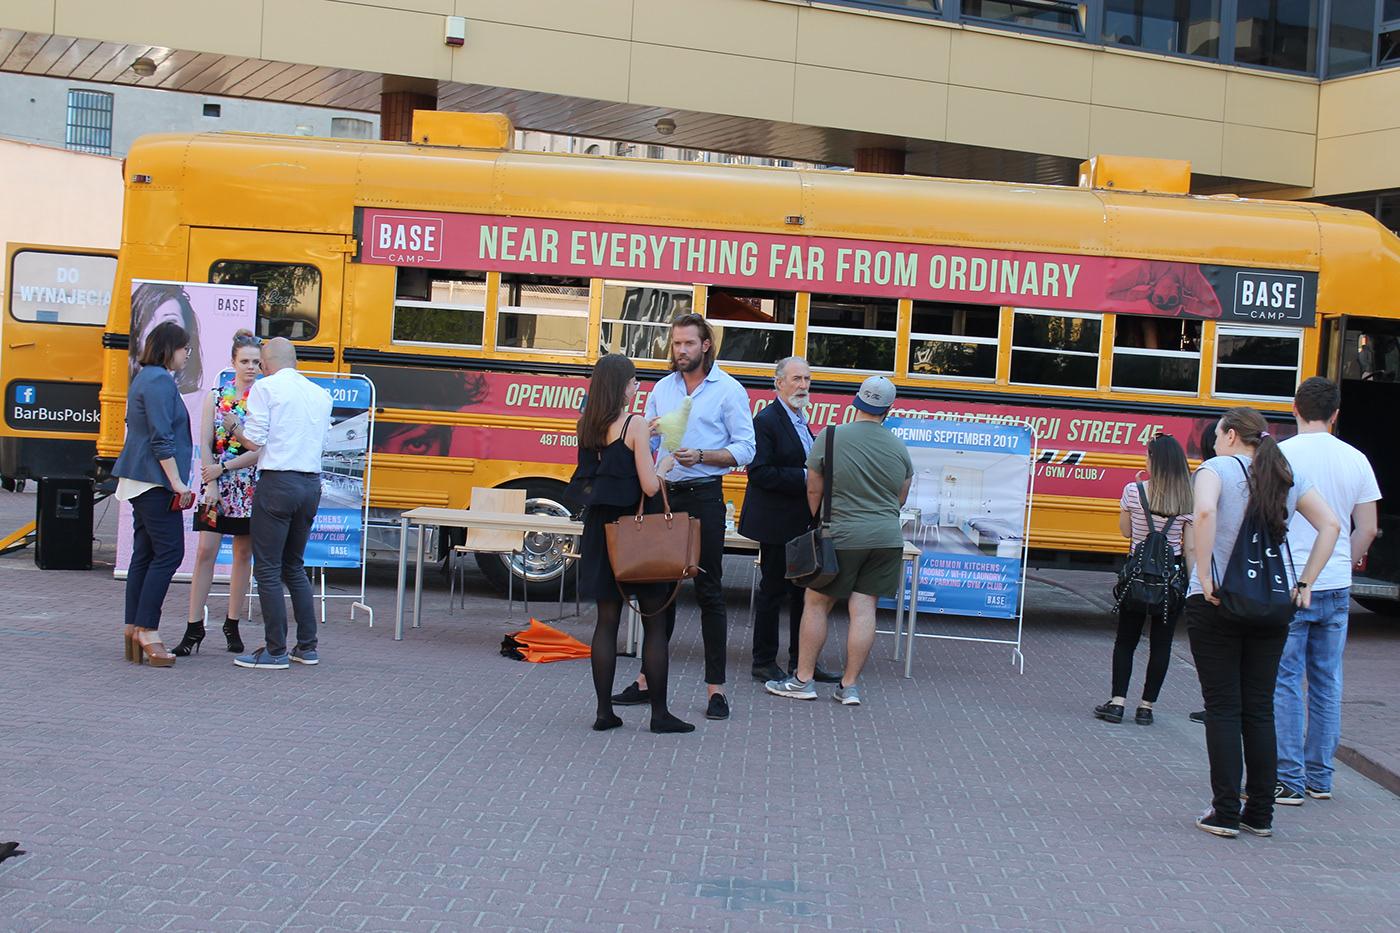 Basecamp Student branding eventu